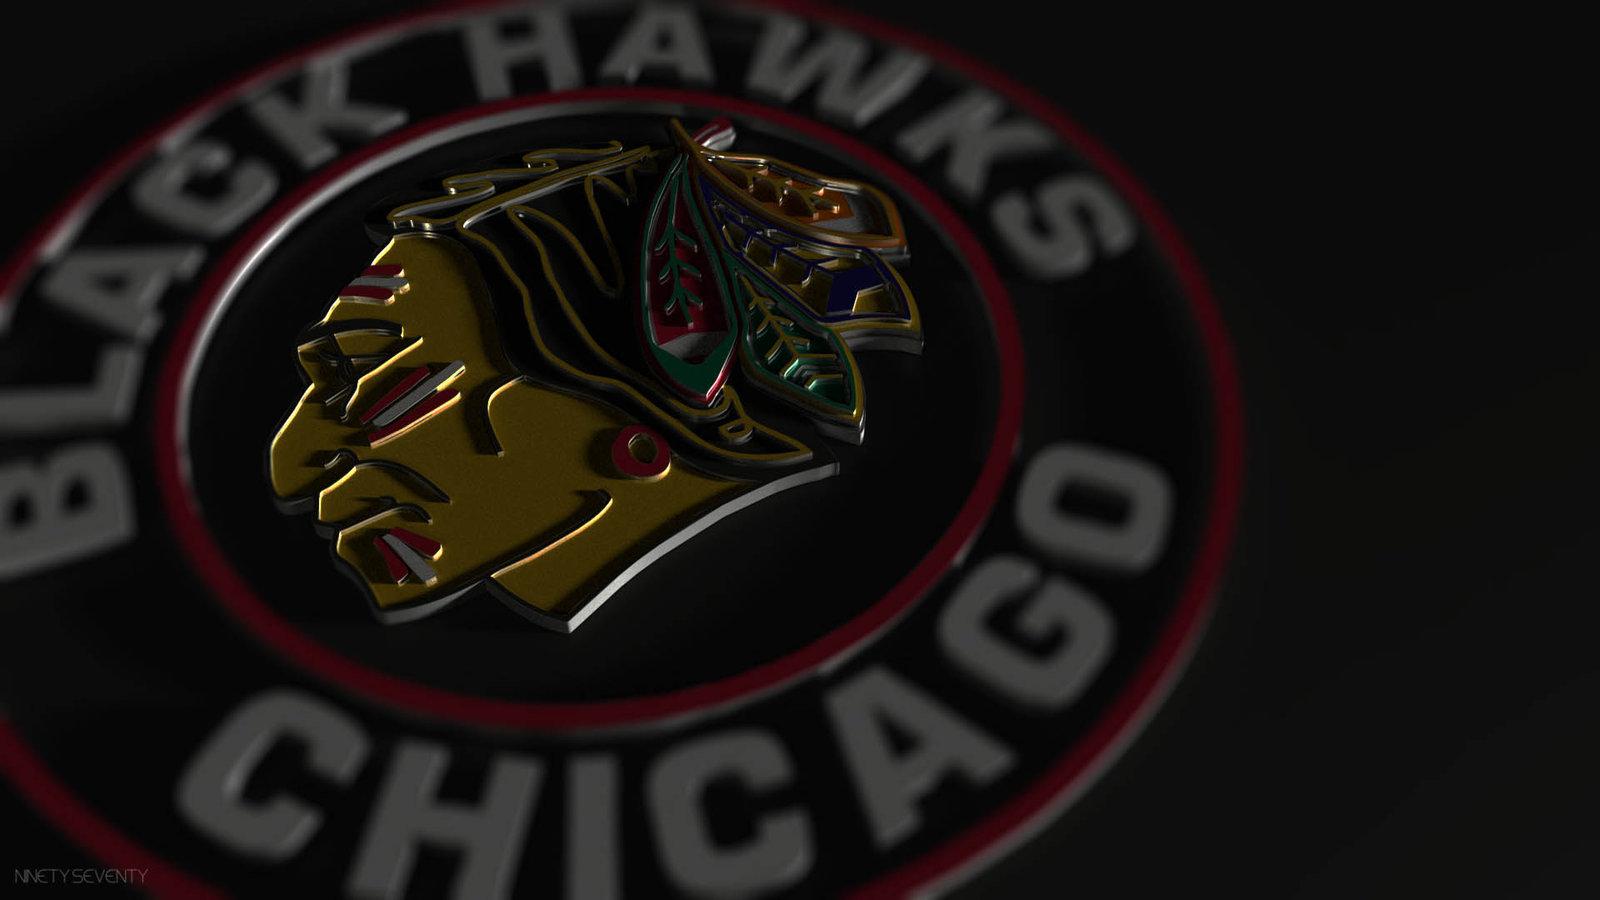 Chicago blackhawks wallpaper free wallpapersafari chicago blackhawks desktop background chicago blackhawks wallpapers 1600x900 voltagebd Images